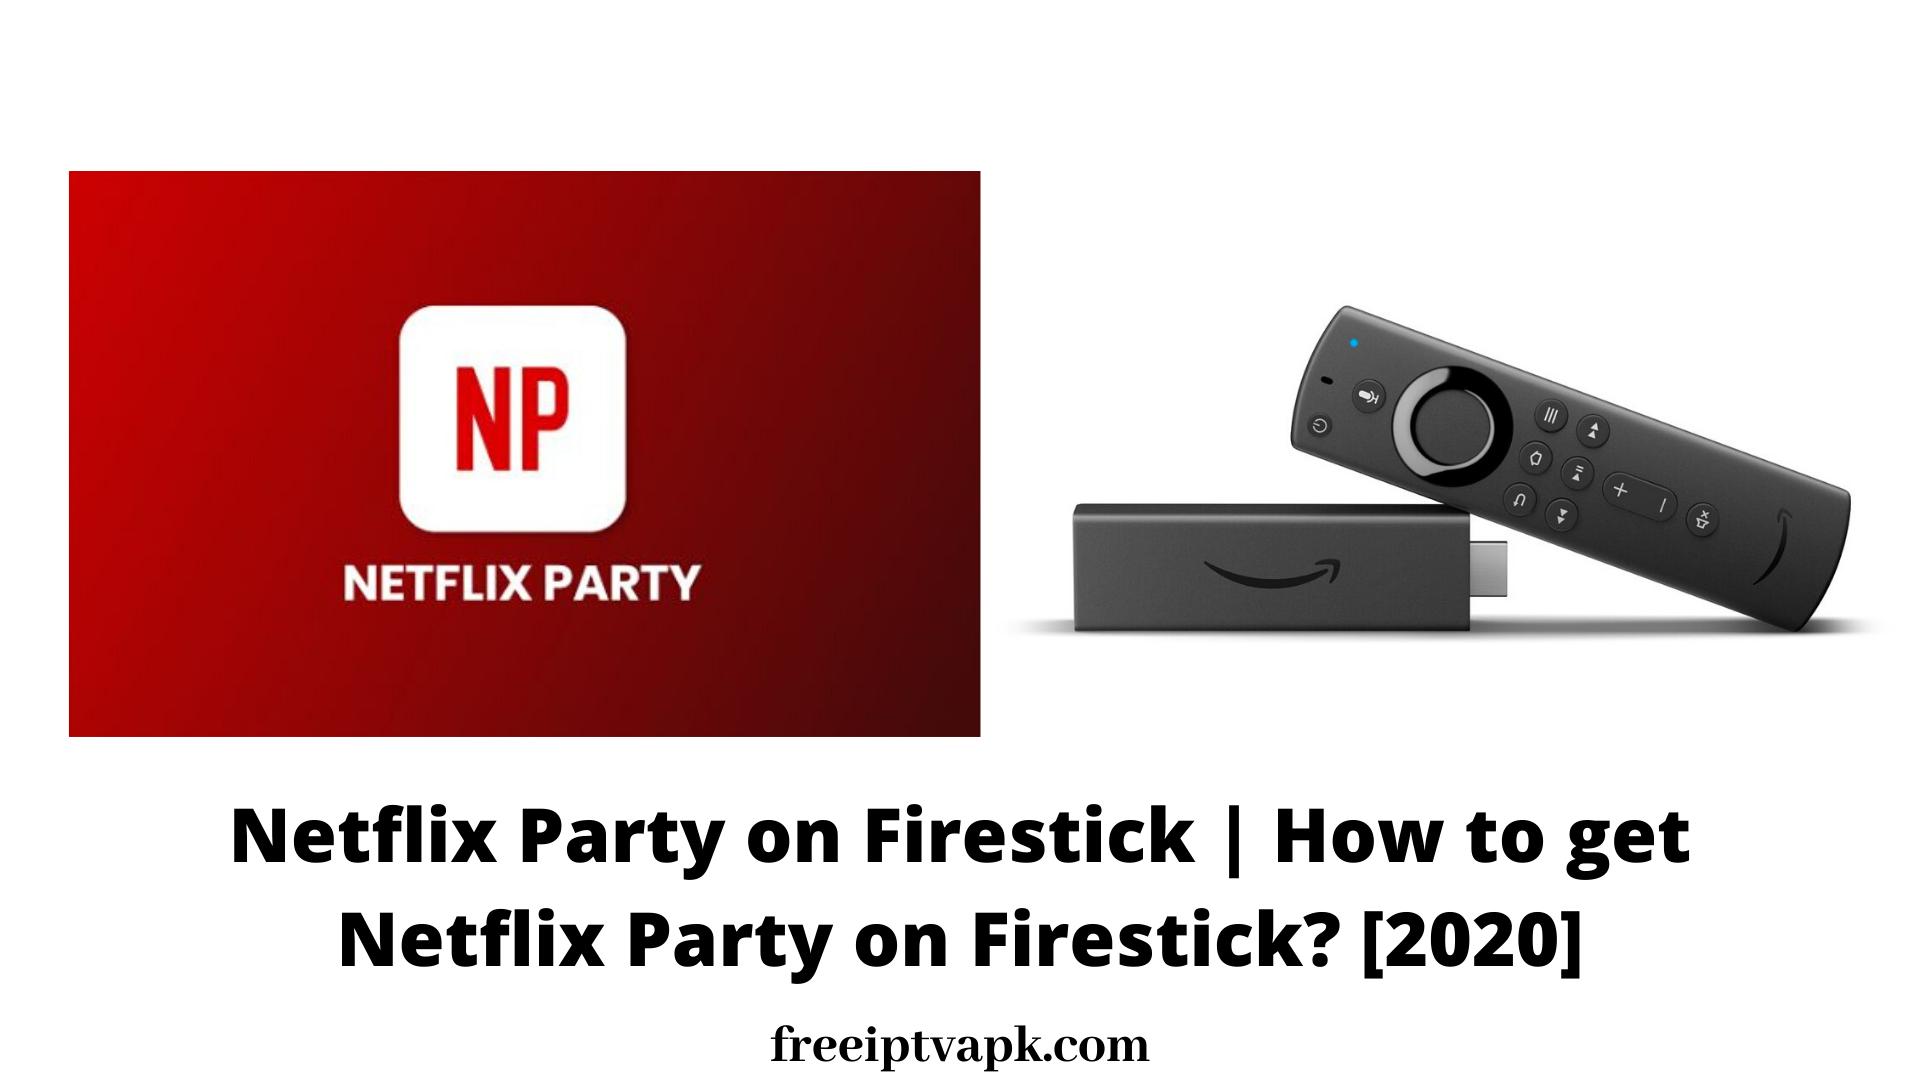 Netflix Party on Firestick | How to get Netflix Party on Firestick? [2020]